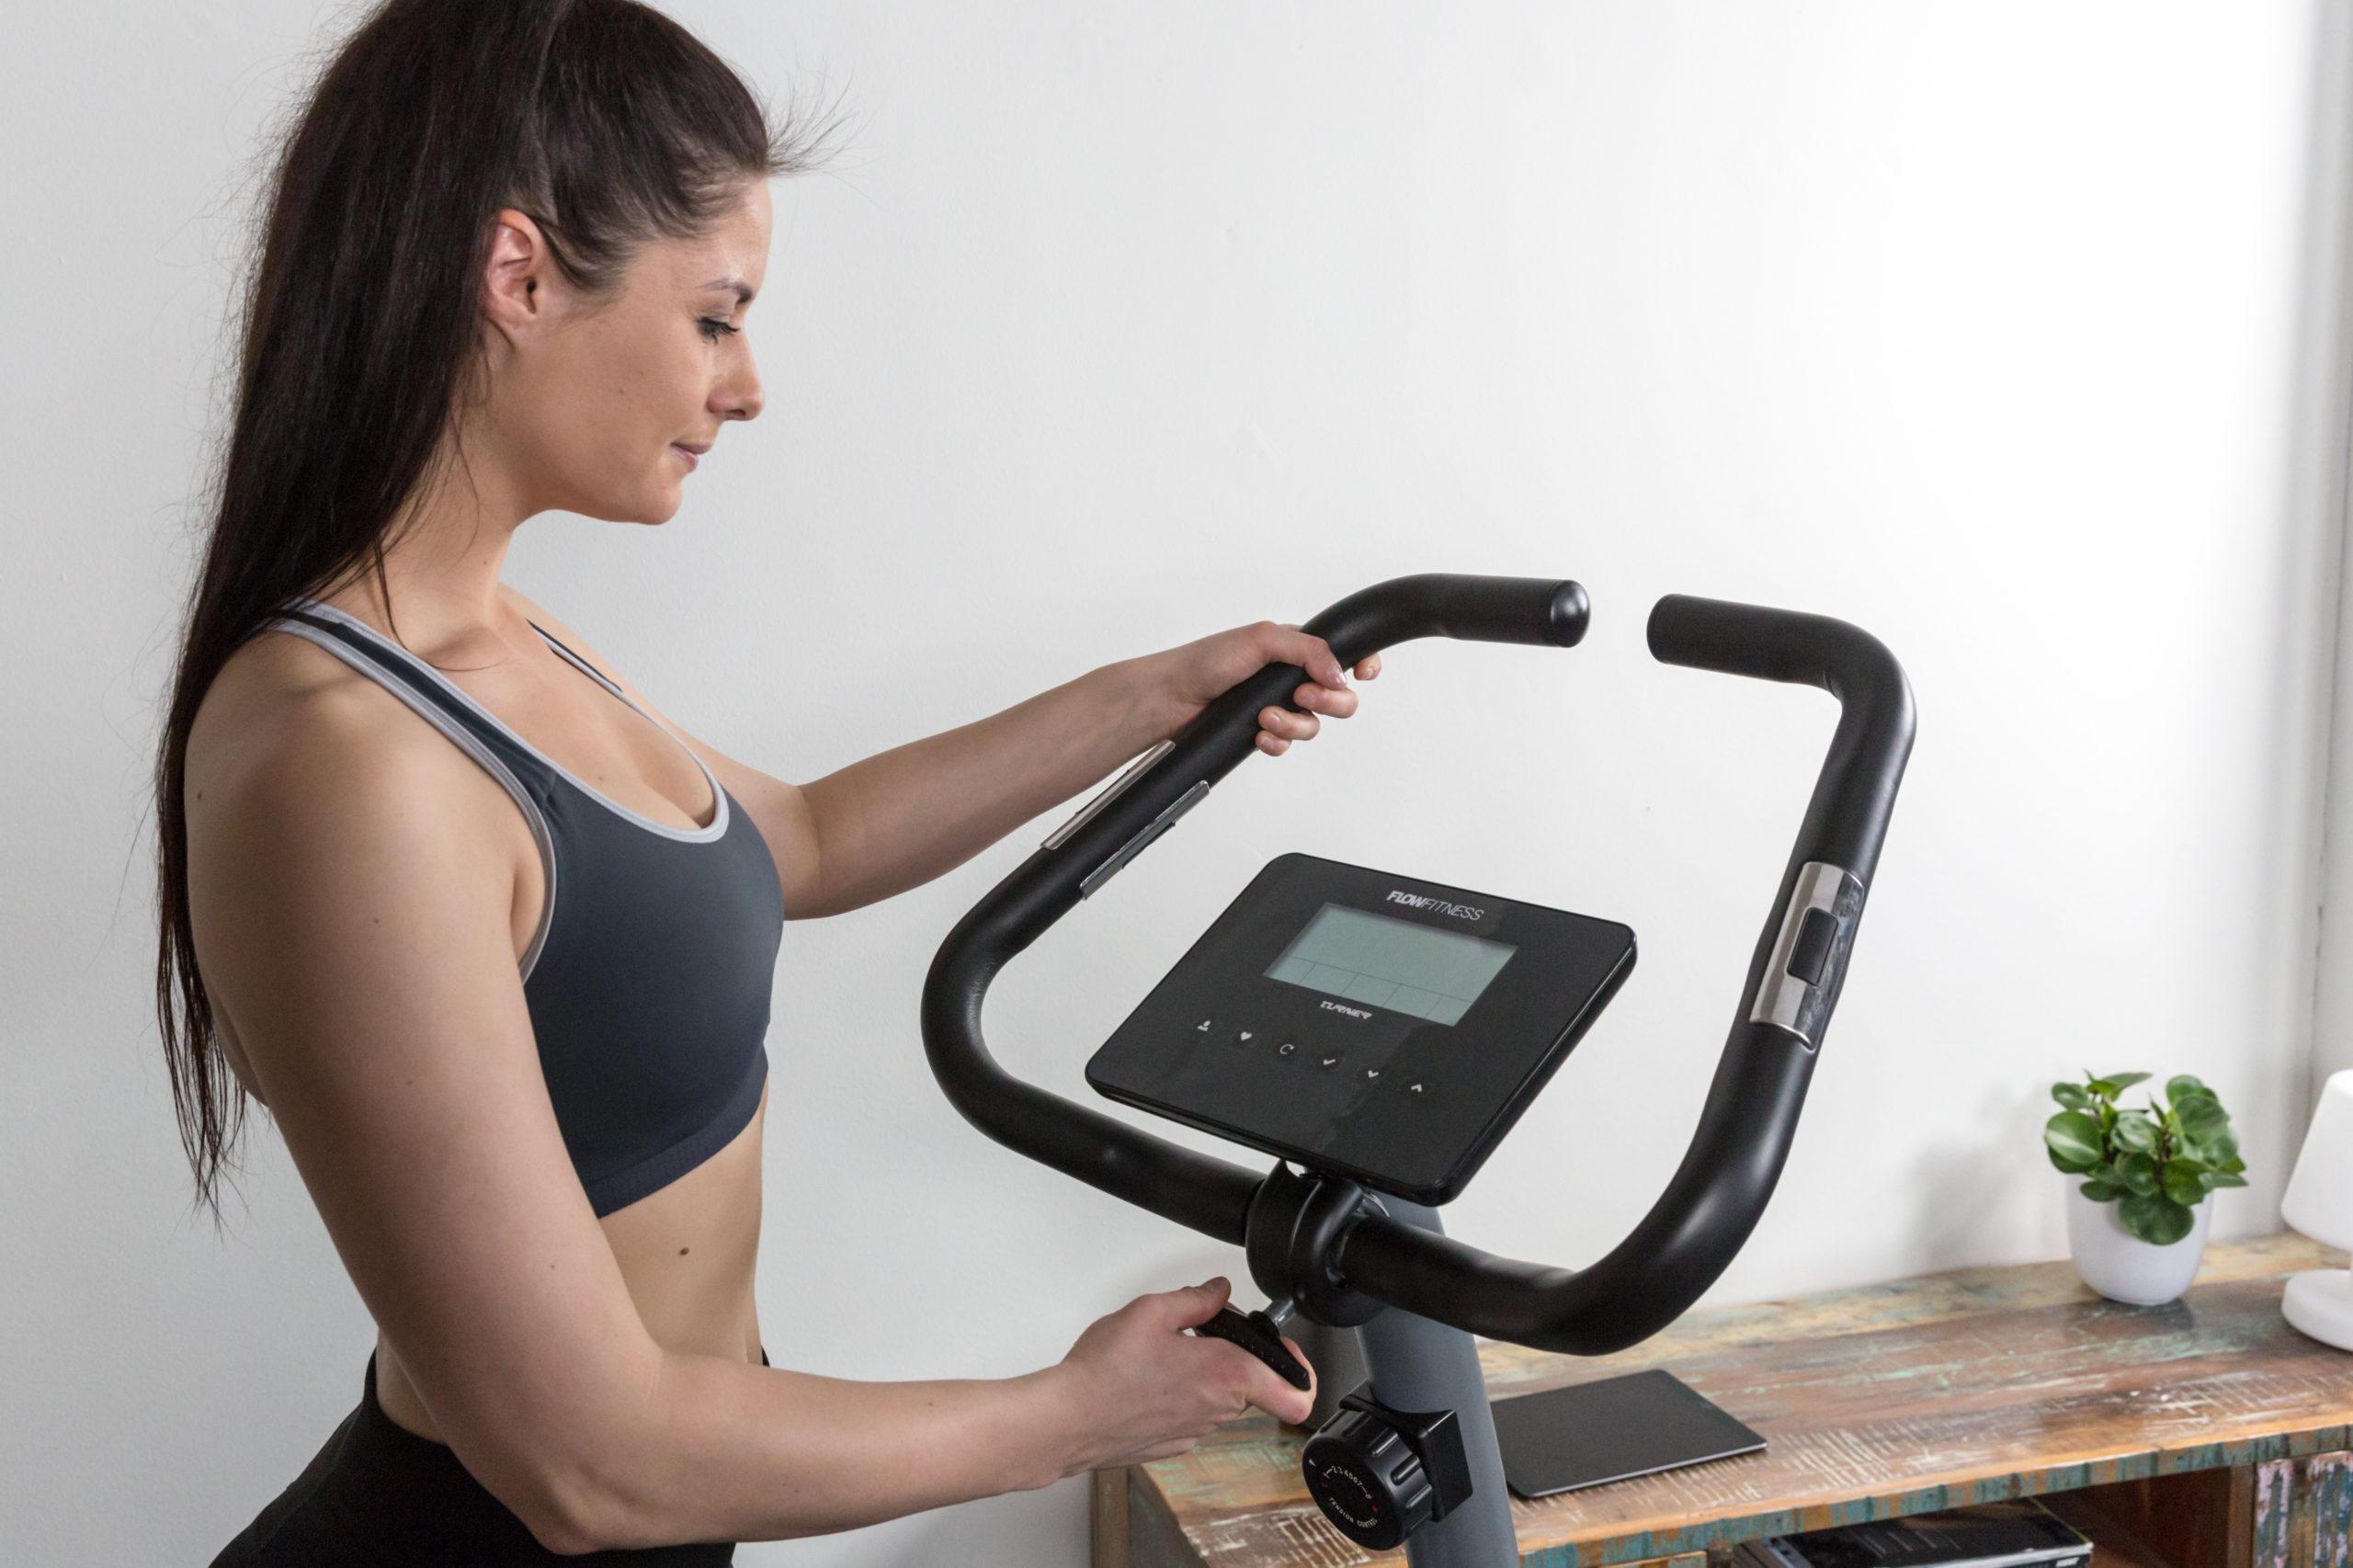 Flow Fitness Tabel Turner DHT500 Hometrainer 2